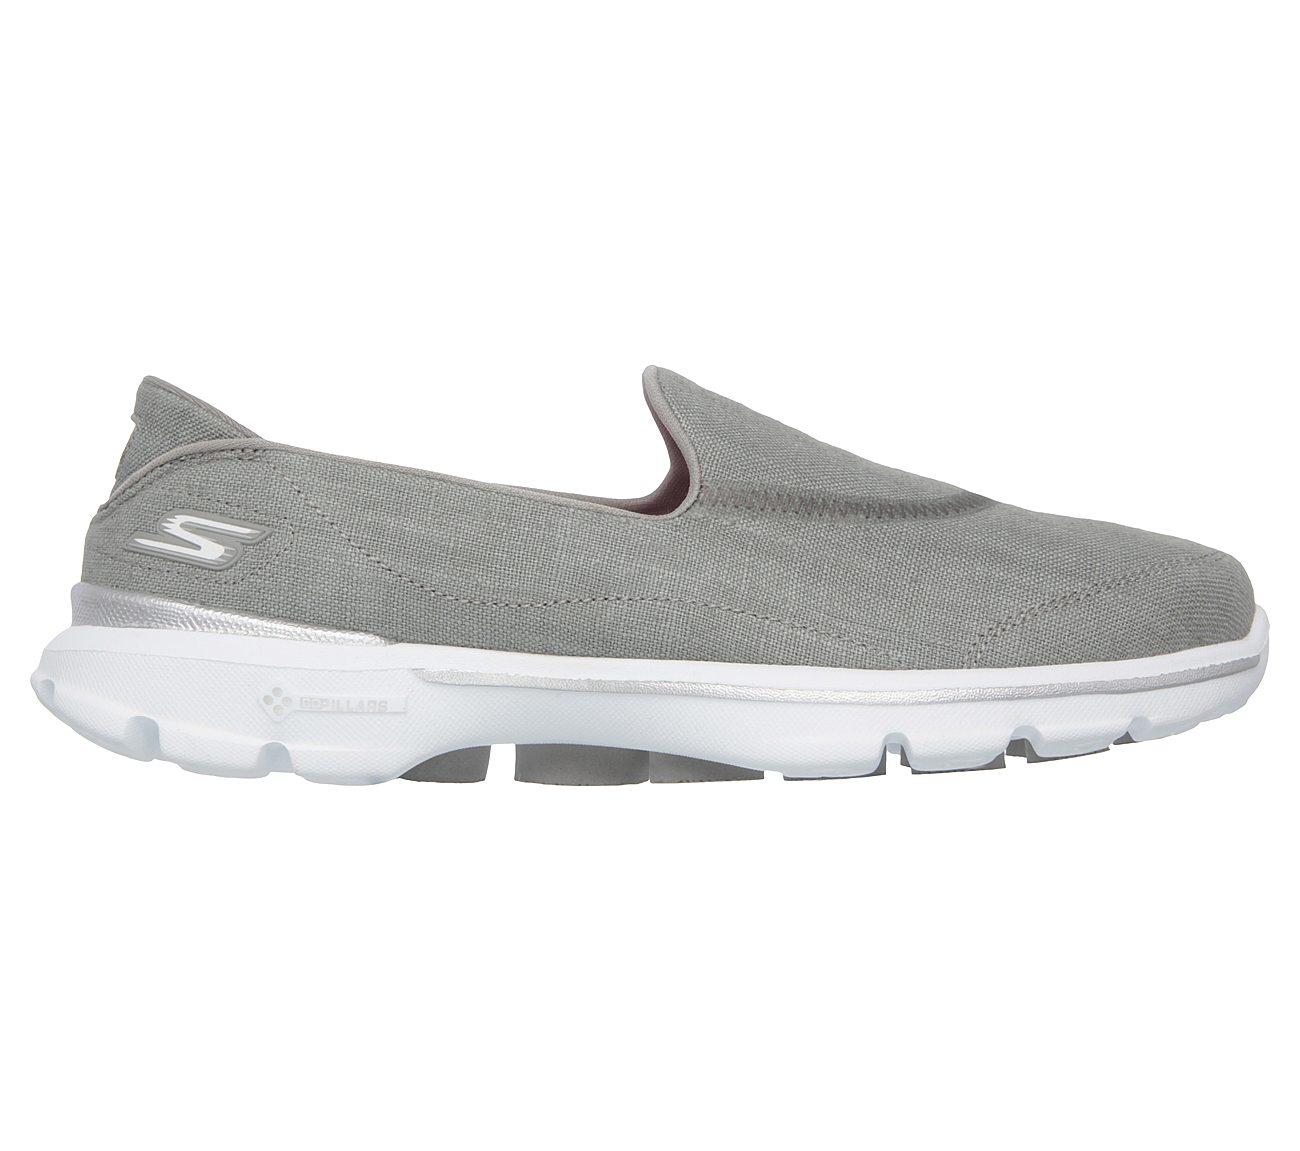 Buy SKECHERS Skechers GOwalk 3